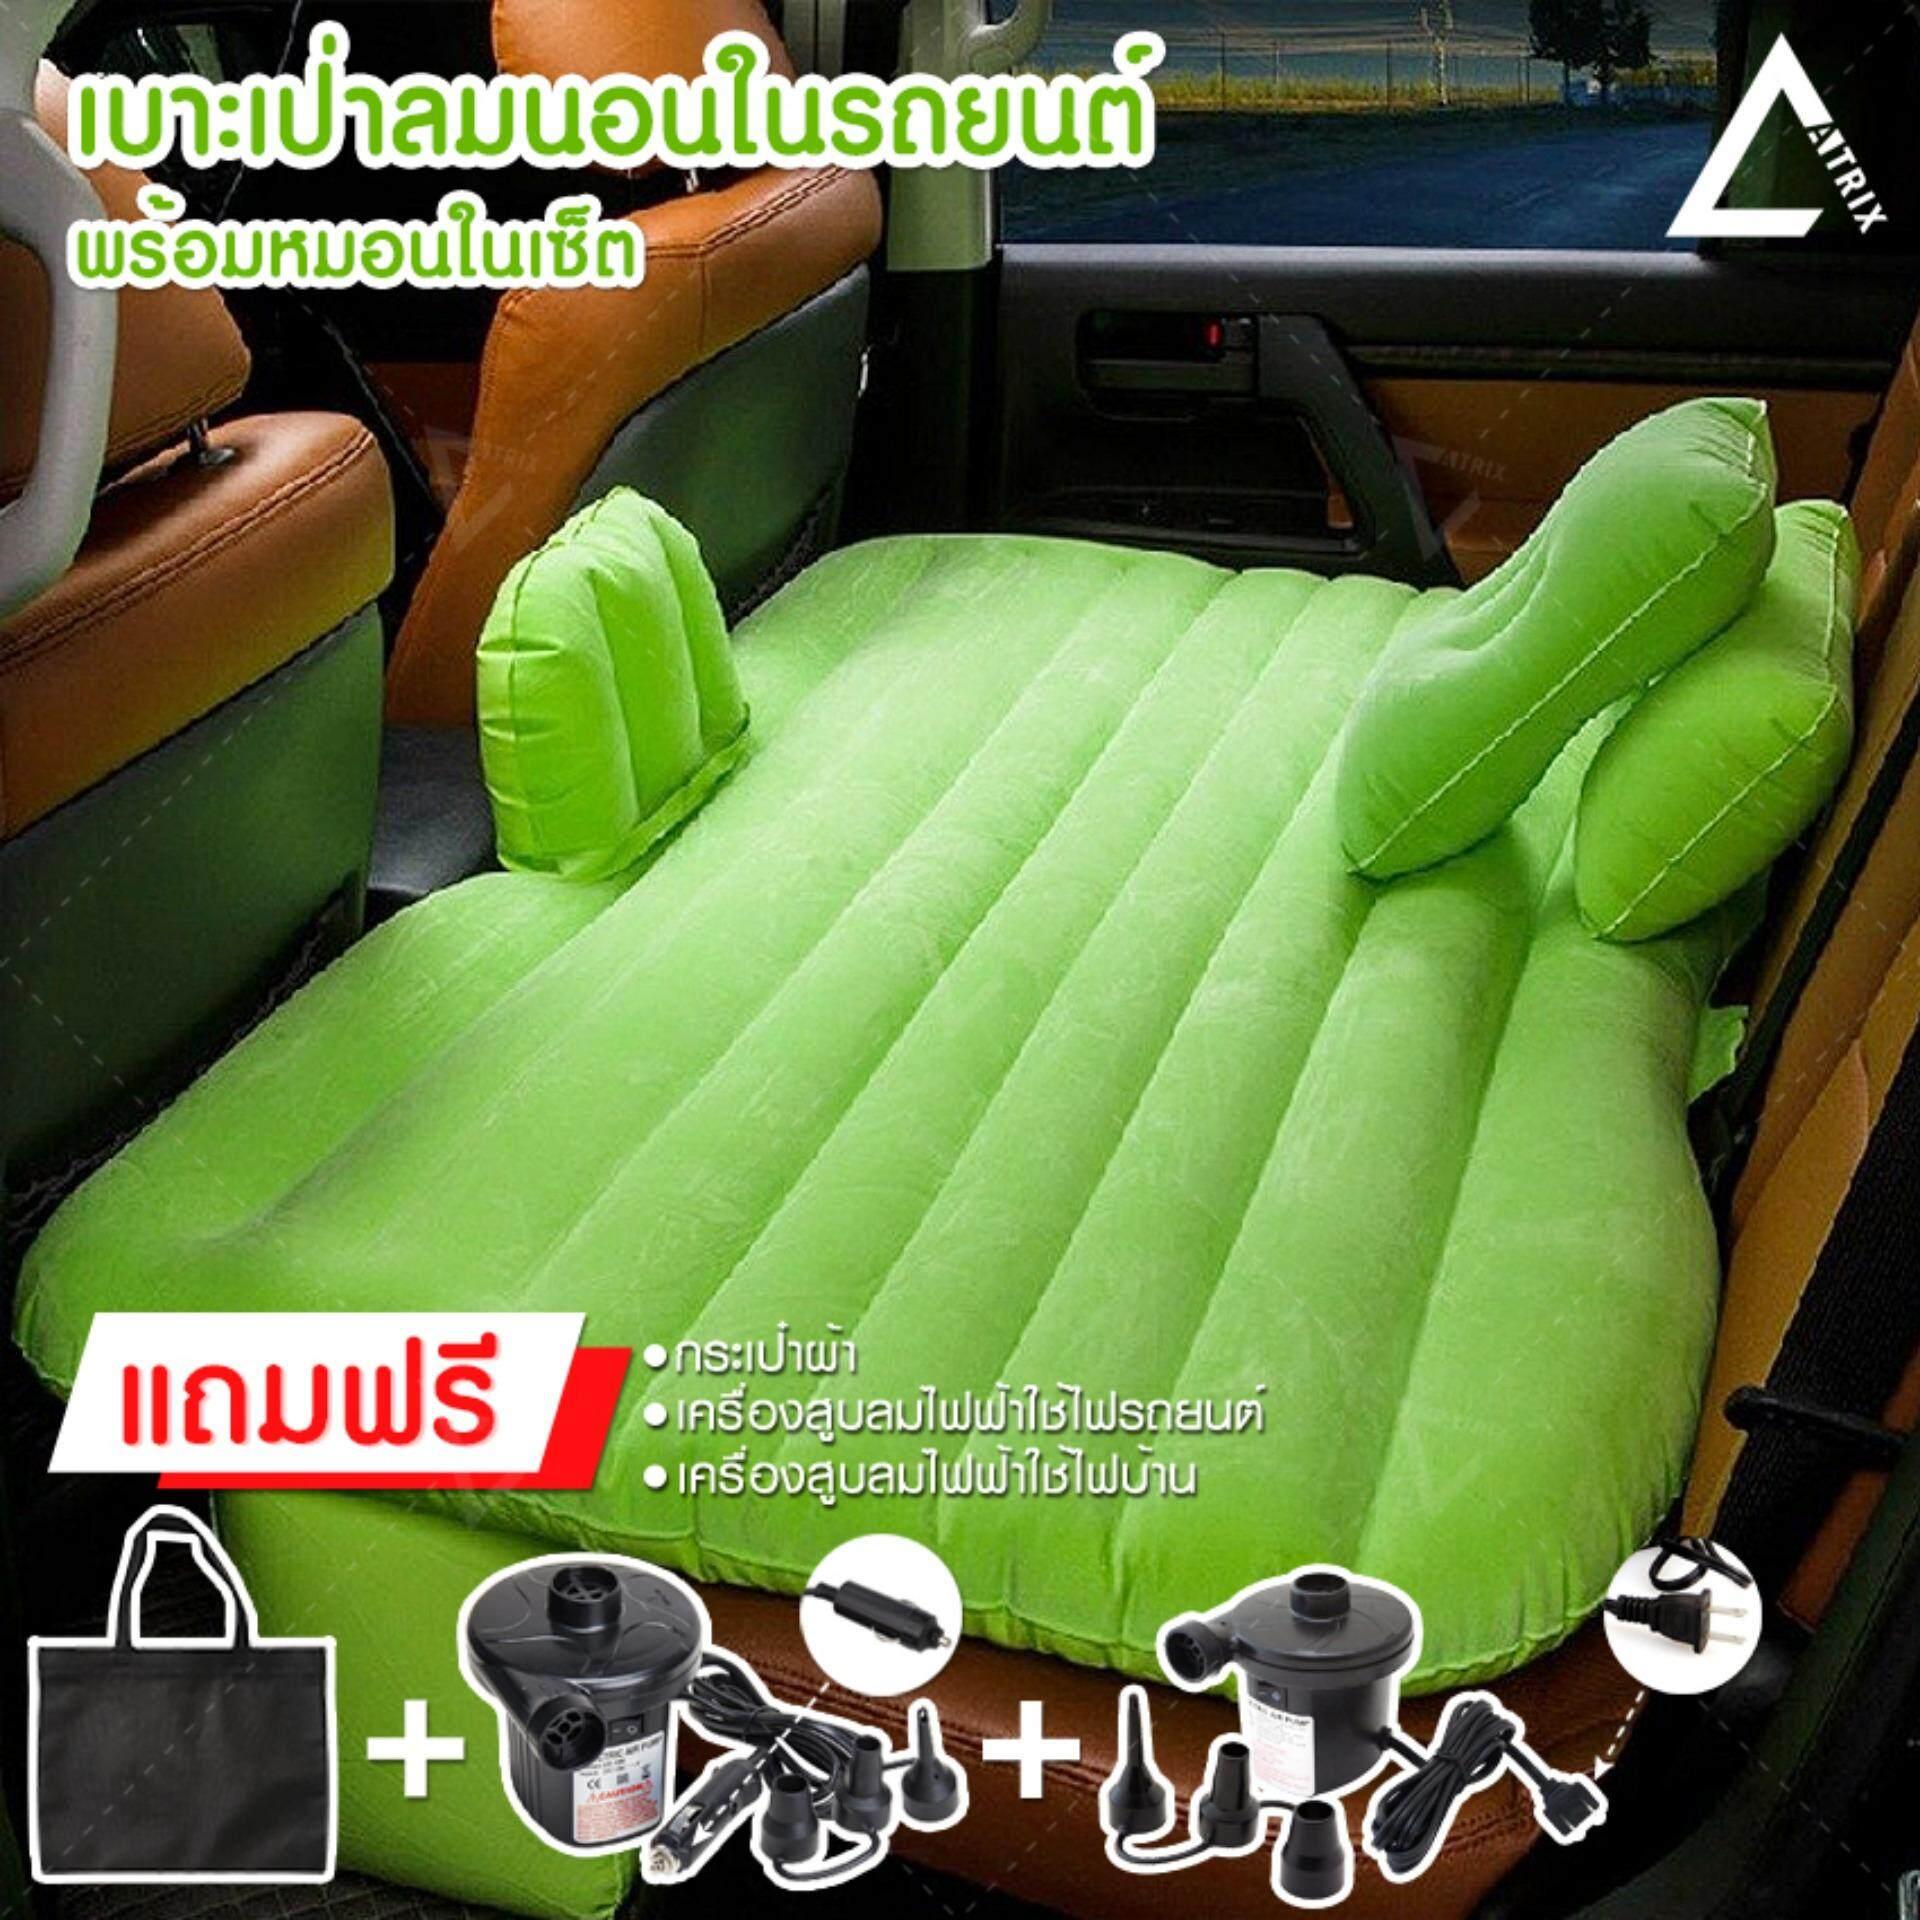 Atrix ซื้อ 1 ได้ถึง 2 เบาะเป่าลมนอนในรถยนต์ ที่นอนในรถ Inflatable Bed In Car มีที่กันคอนโซลหน้า พื้นผิวกำมะหยี่นุ่มสบายทนทานยืดหยุ่นสูงใช้เป็นเบาะรองนั่งนอกสถานที่ เป็นแพลอยในน้ำได้ รุ่น Kds 0009 สีเขียว Green แถมฟรี เครื่องสูบลมอัตโนมัติรุ่น Kdh 0026 ใน Thailand